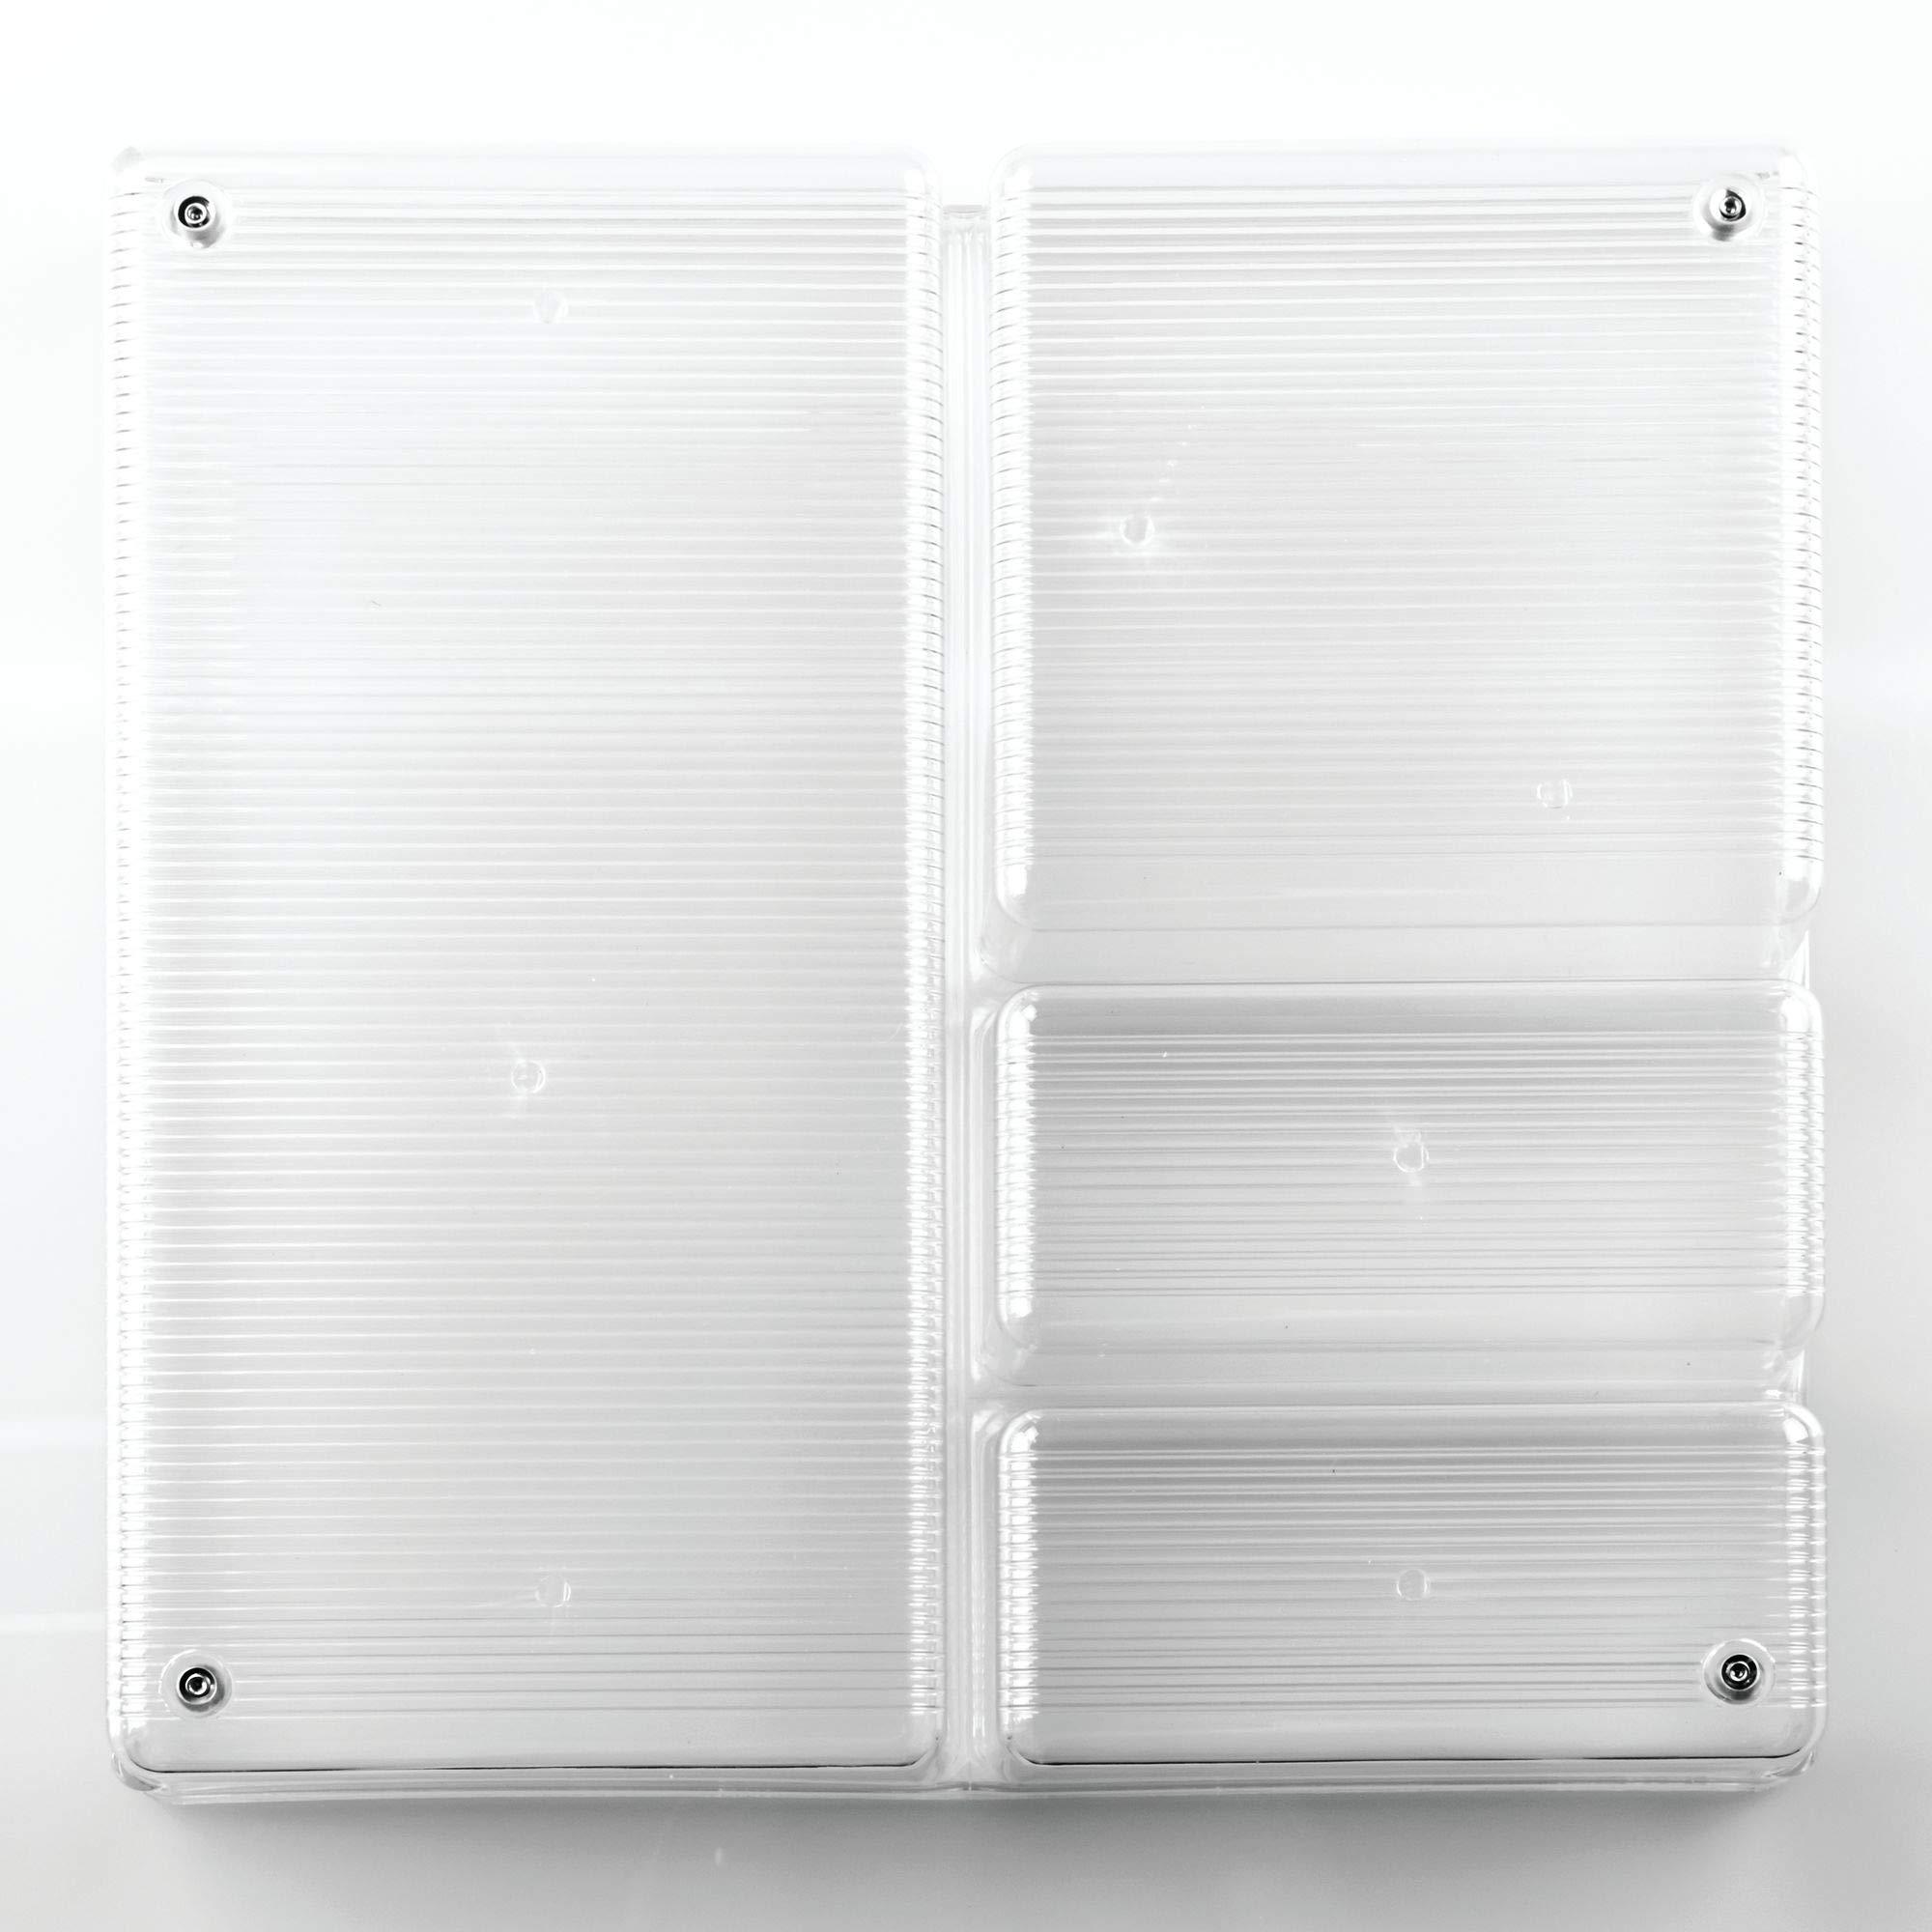 InterDesign Linus Plastic Grand Divided Organizer, Storage Container for Kitchen, Vanity, Bathroom Drawers, 12'' x 12'' x 2'' Clear by InterDesign (Image #5)